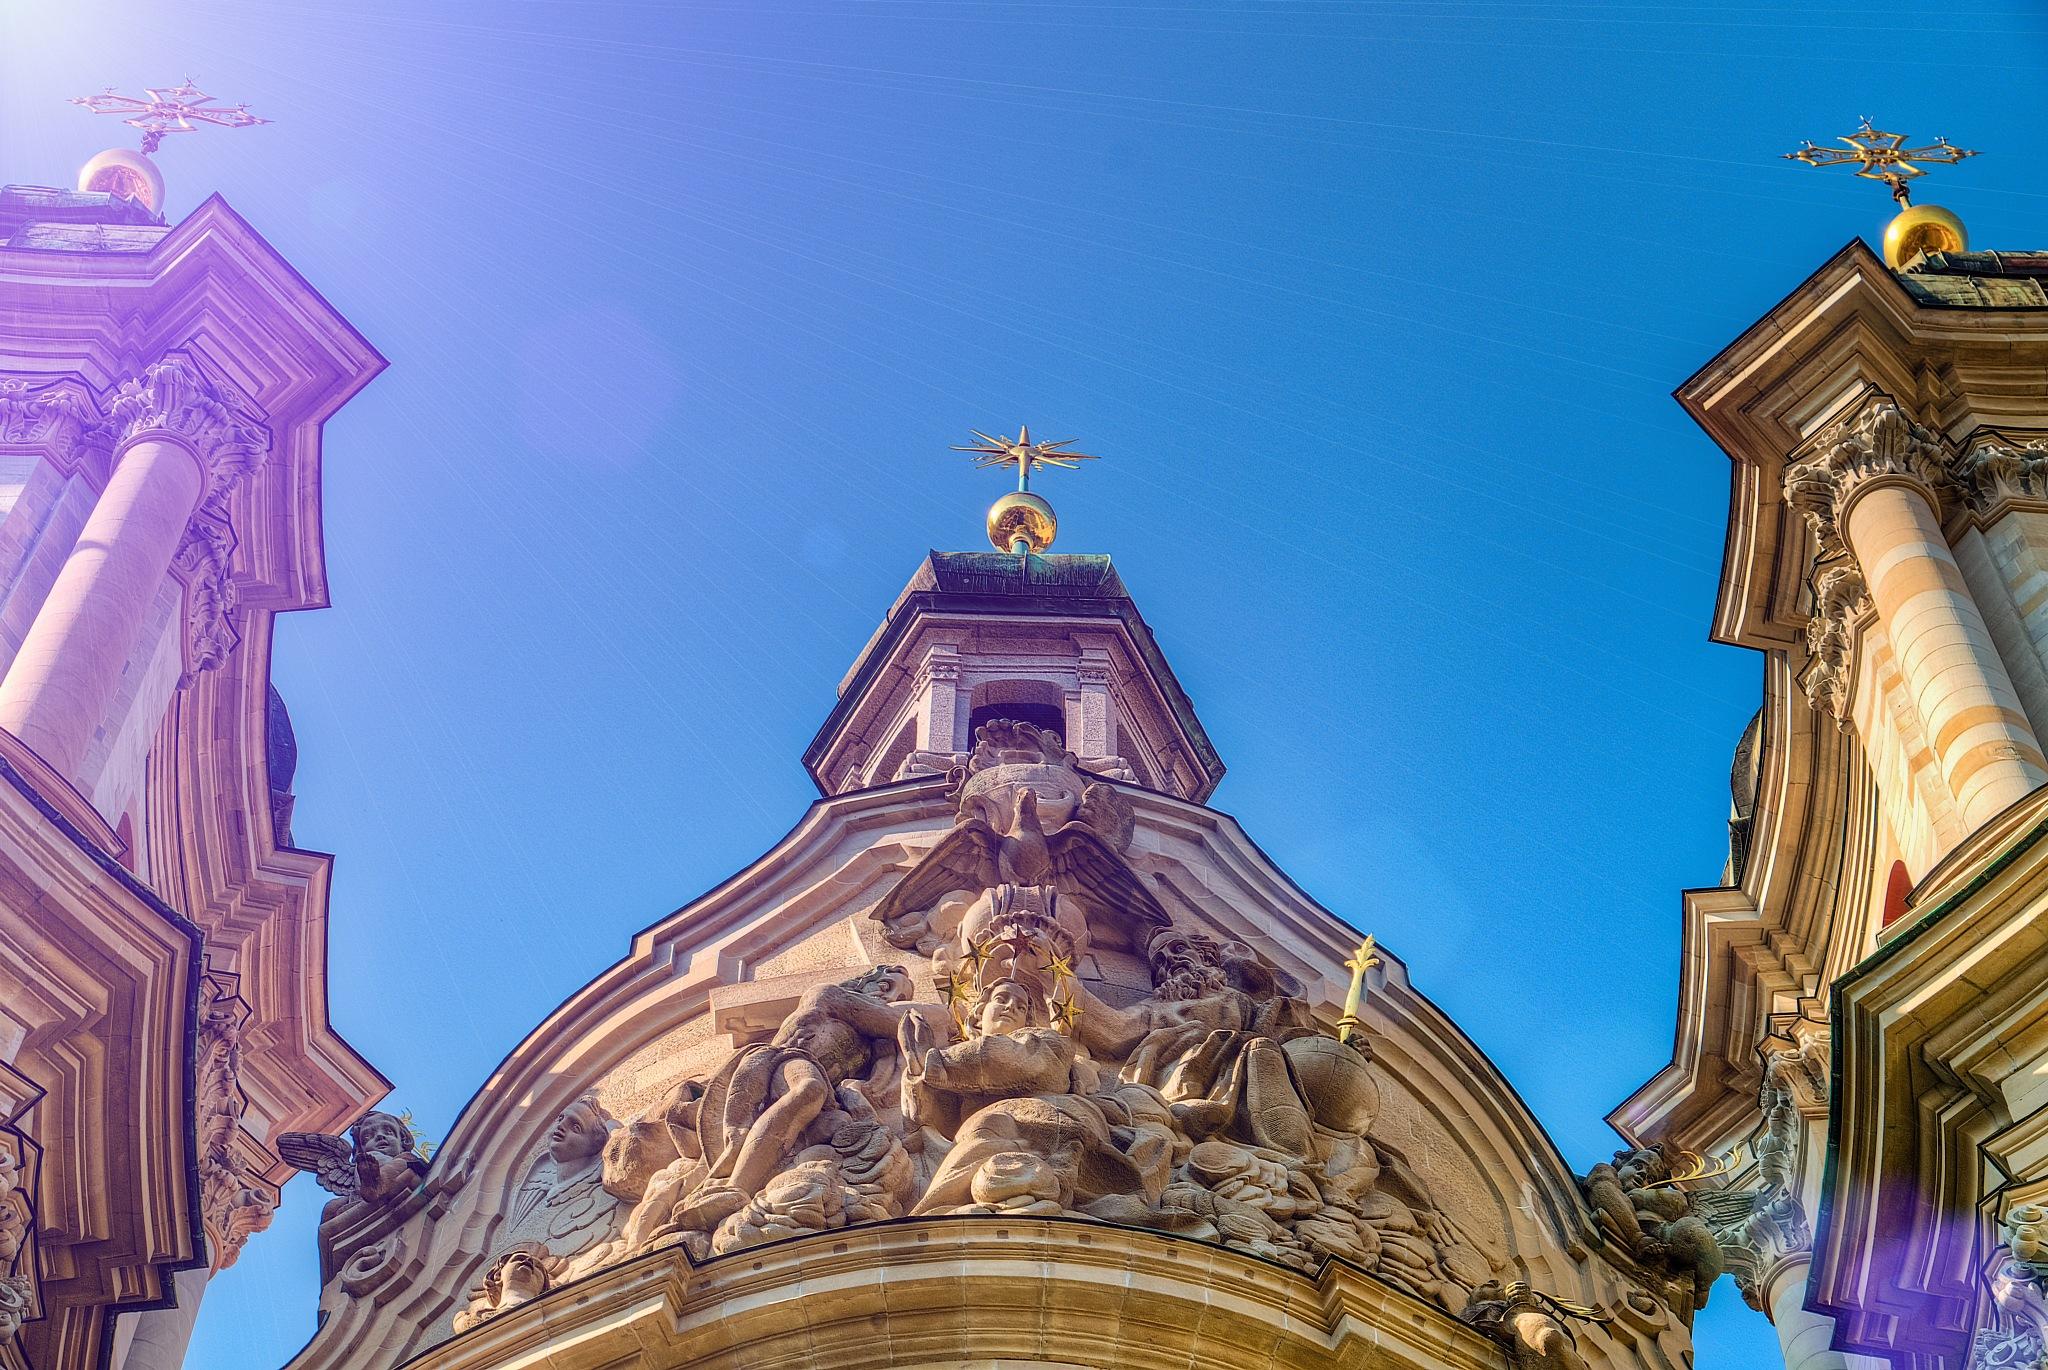 Cathedral Saint Gall, Switzerland by Raffaele Capozzi